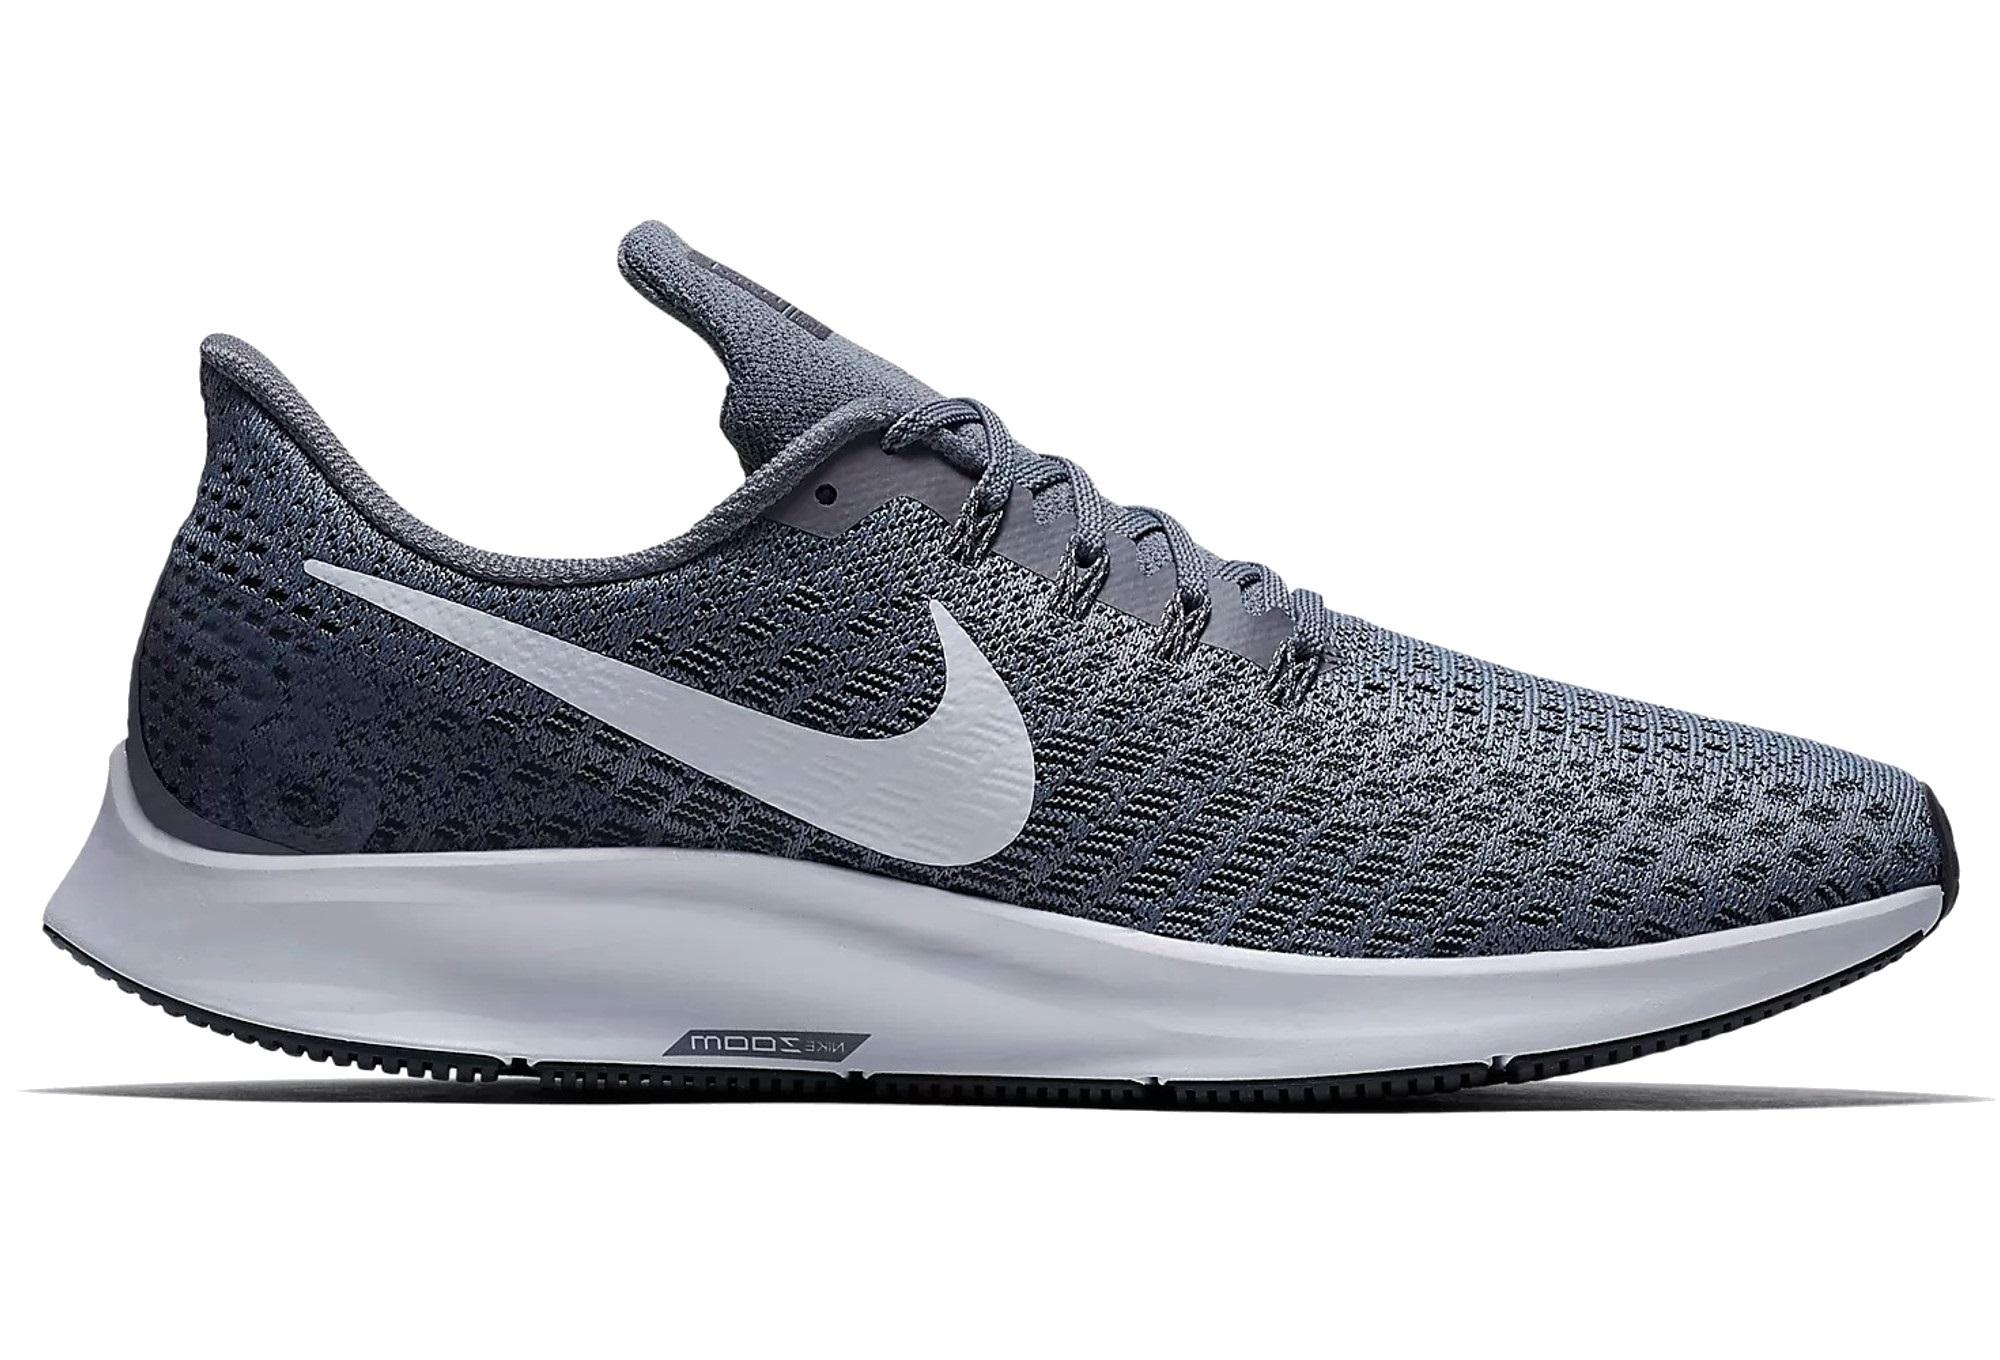 save off 7c8dc 6d26e Chaussures de Running Nike Air Zoom Pegasus 35 Gris